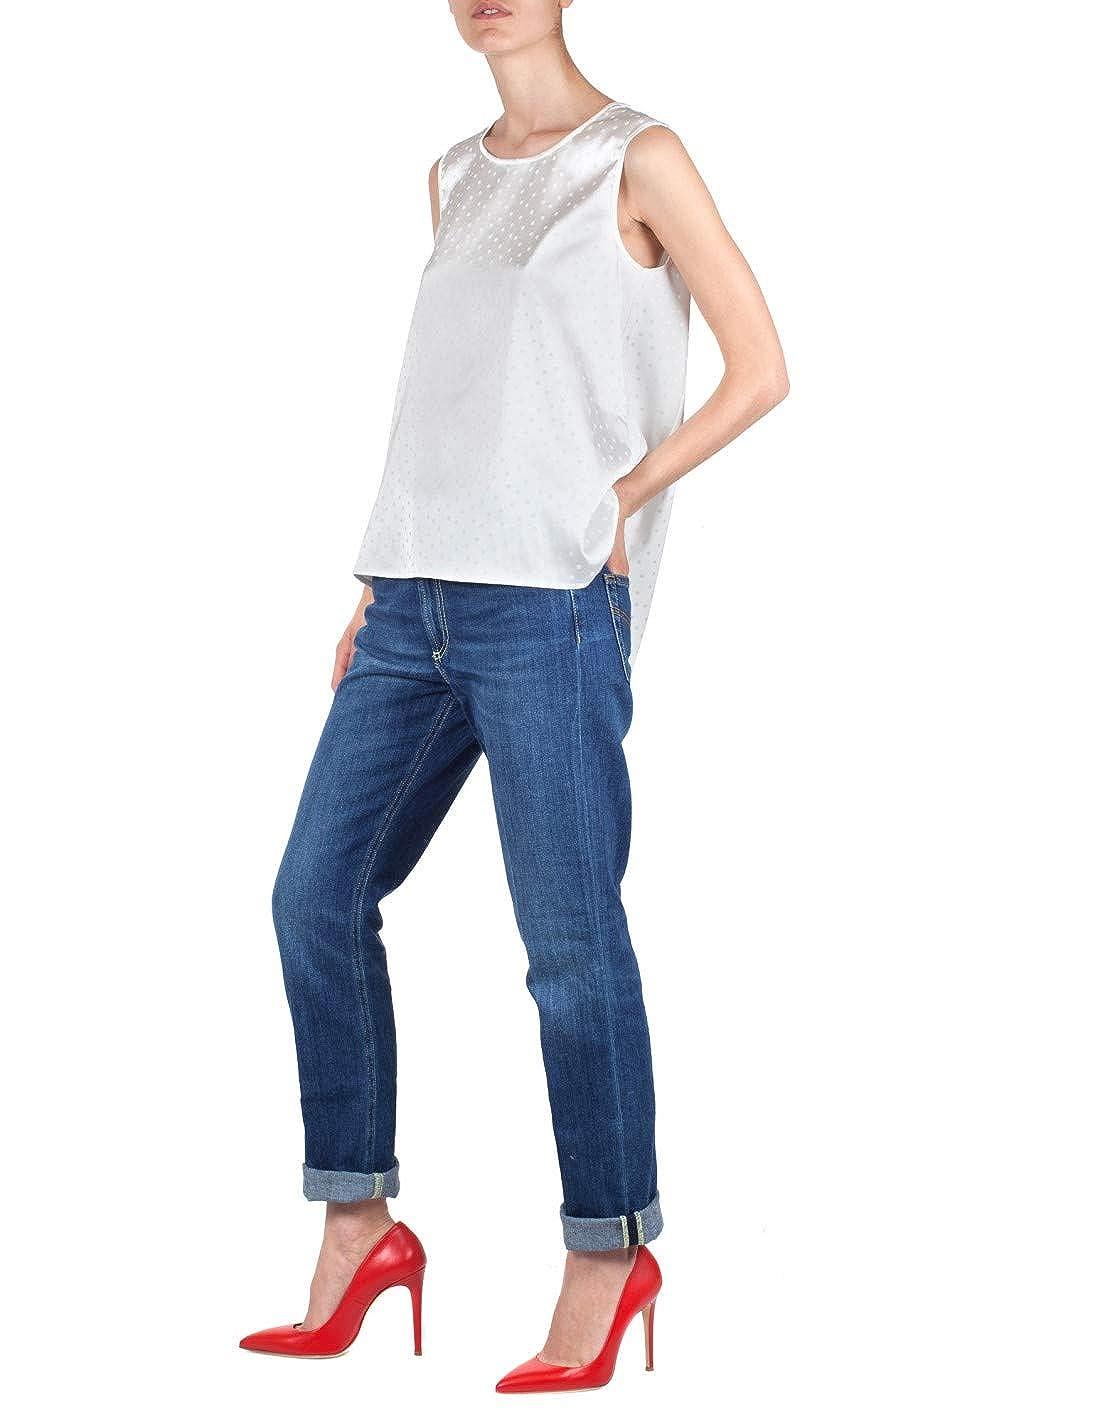 Top Woman Cream S53040 90P36 Top Cue Panna Spring//Summer 2019-331117035 High